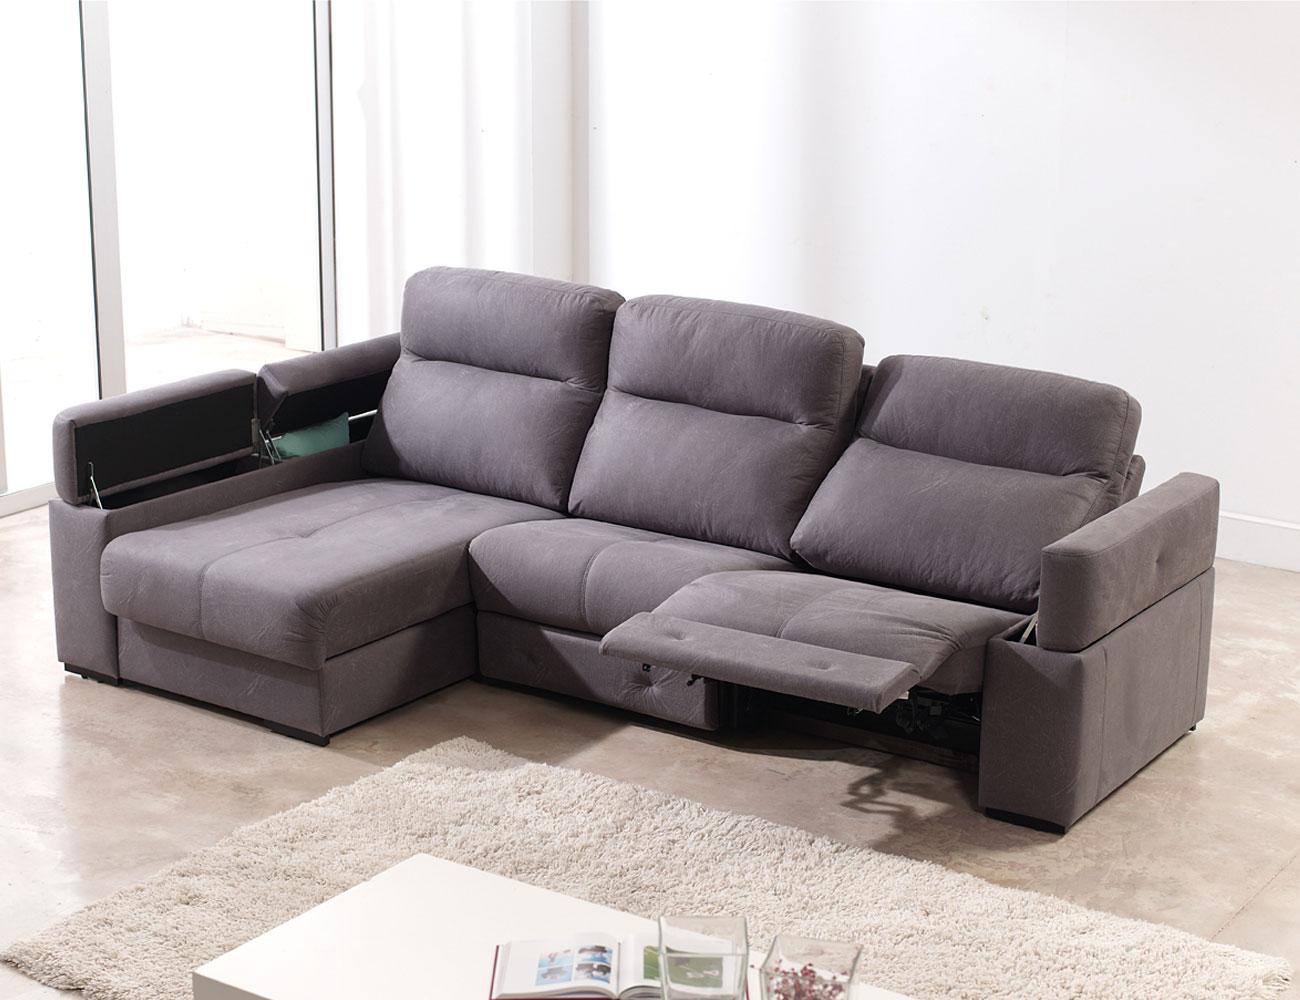 Sofa chaiselongue relax motor electrico 3 arcon 19